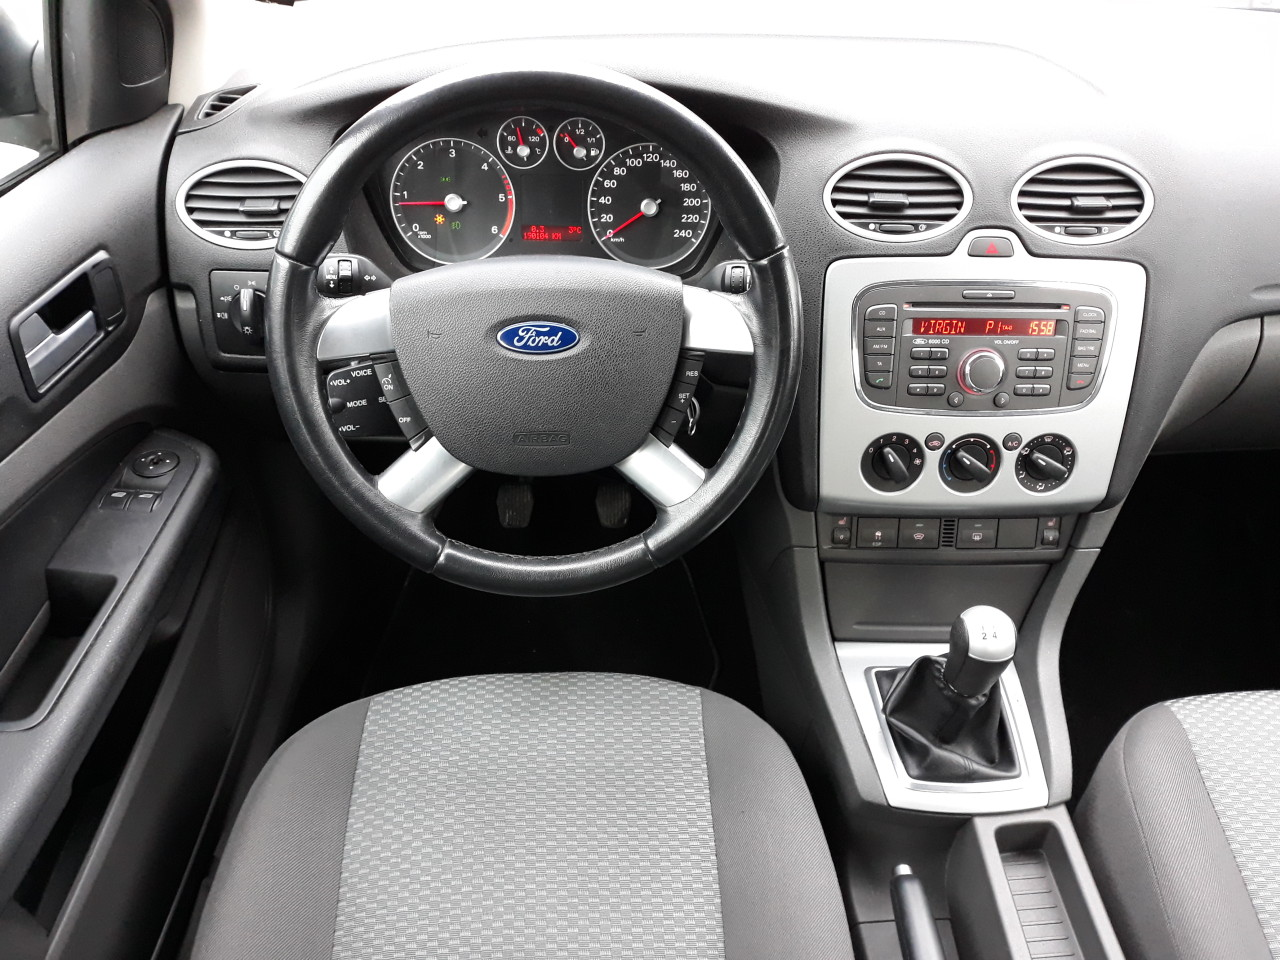 Ford Focus 1.6Tdci 109Cp.Euro4.Klima 2008